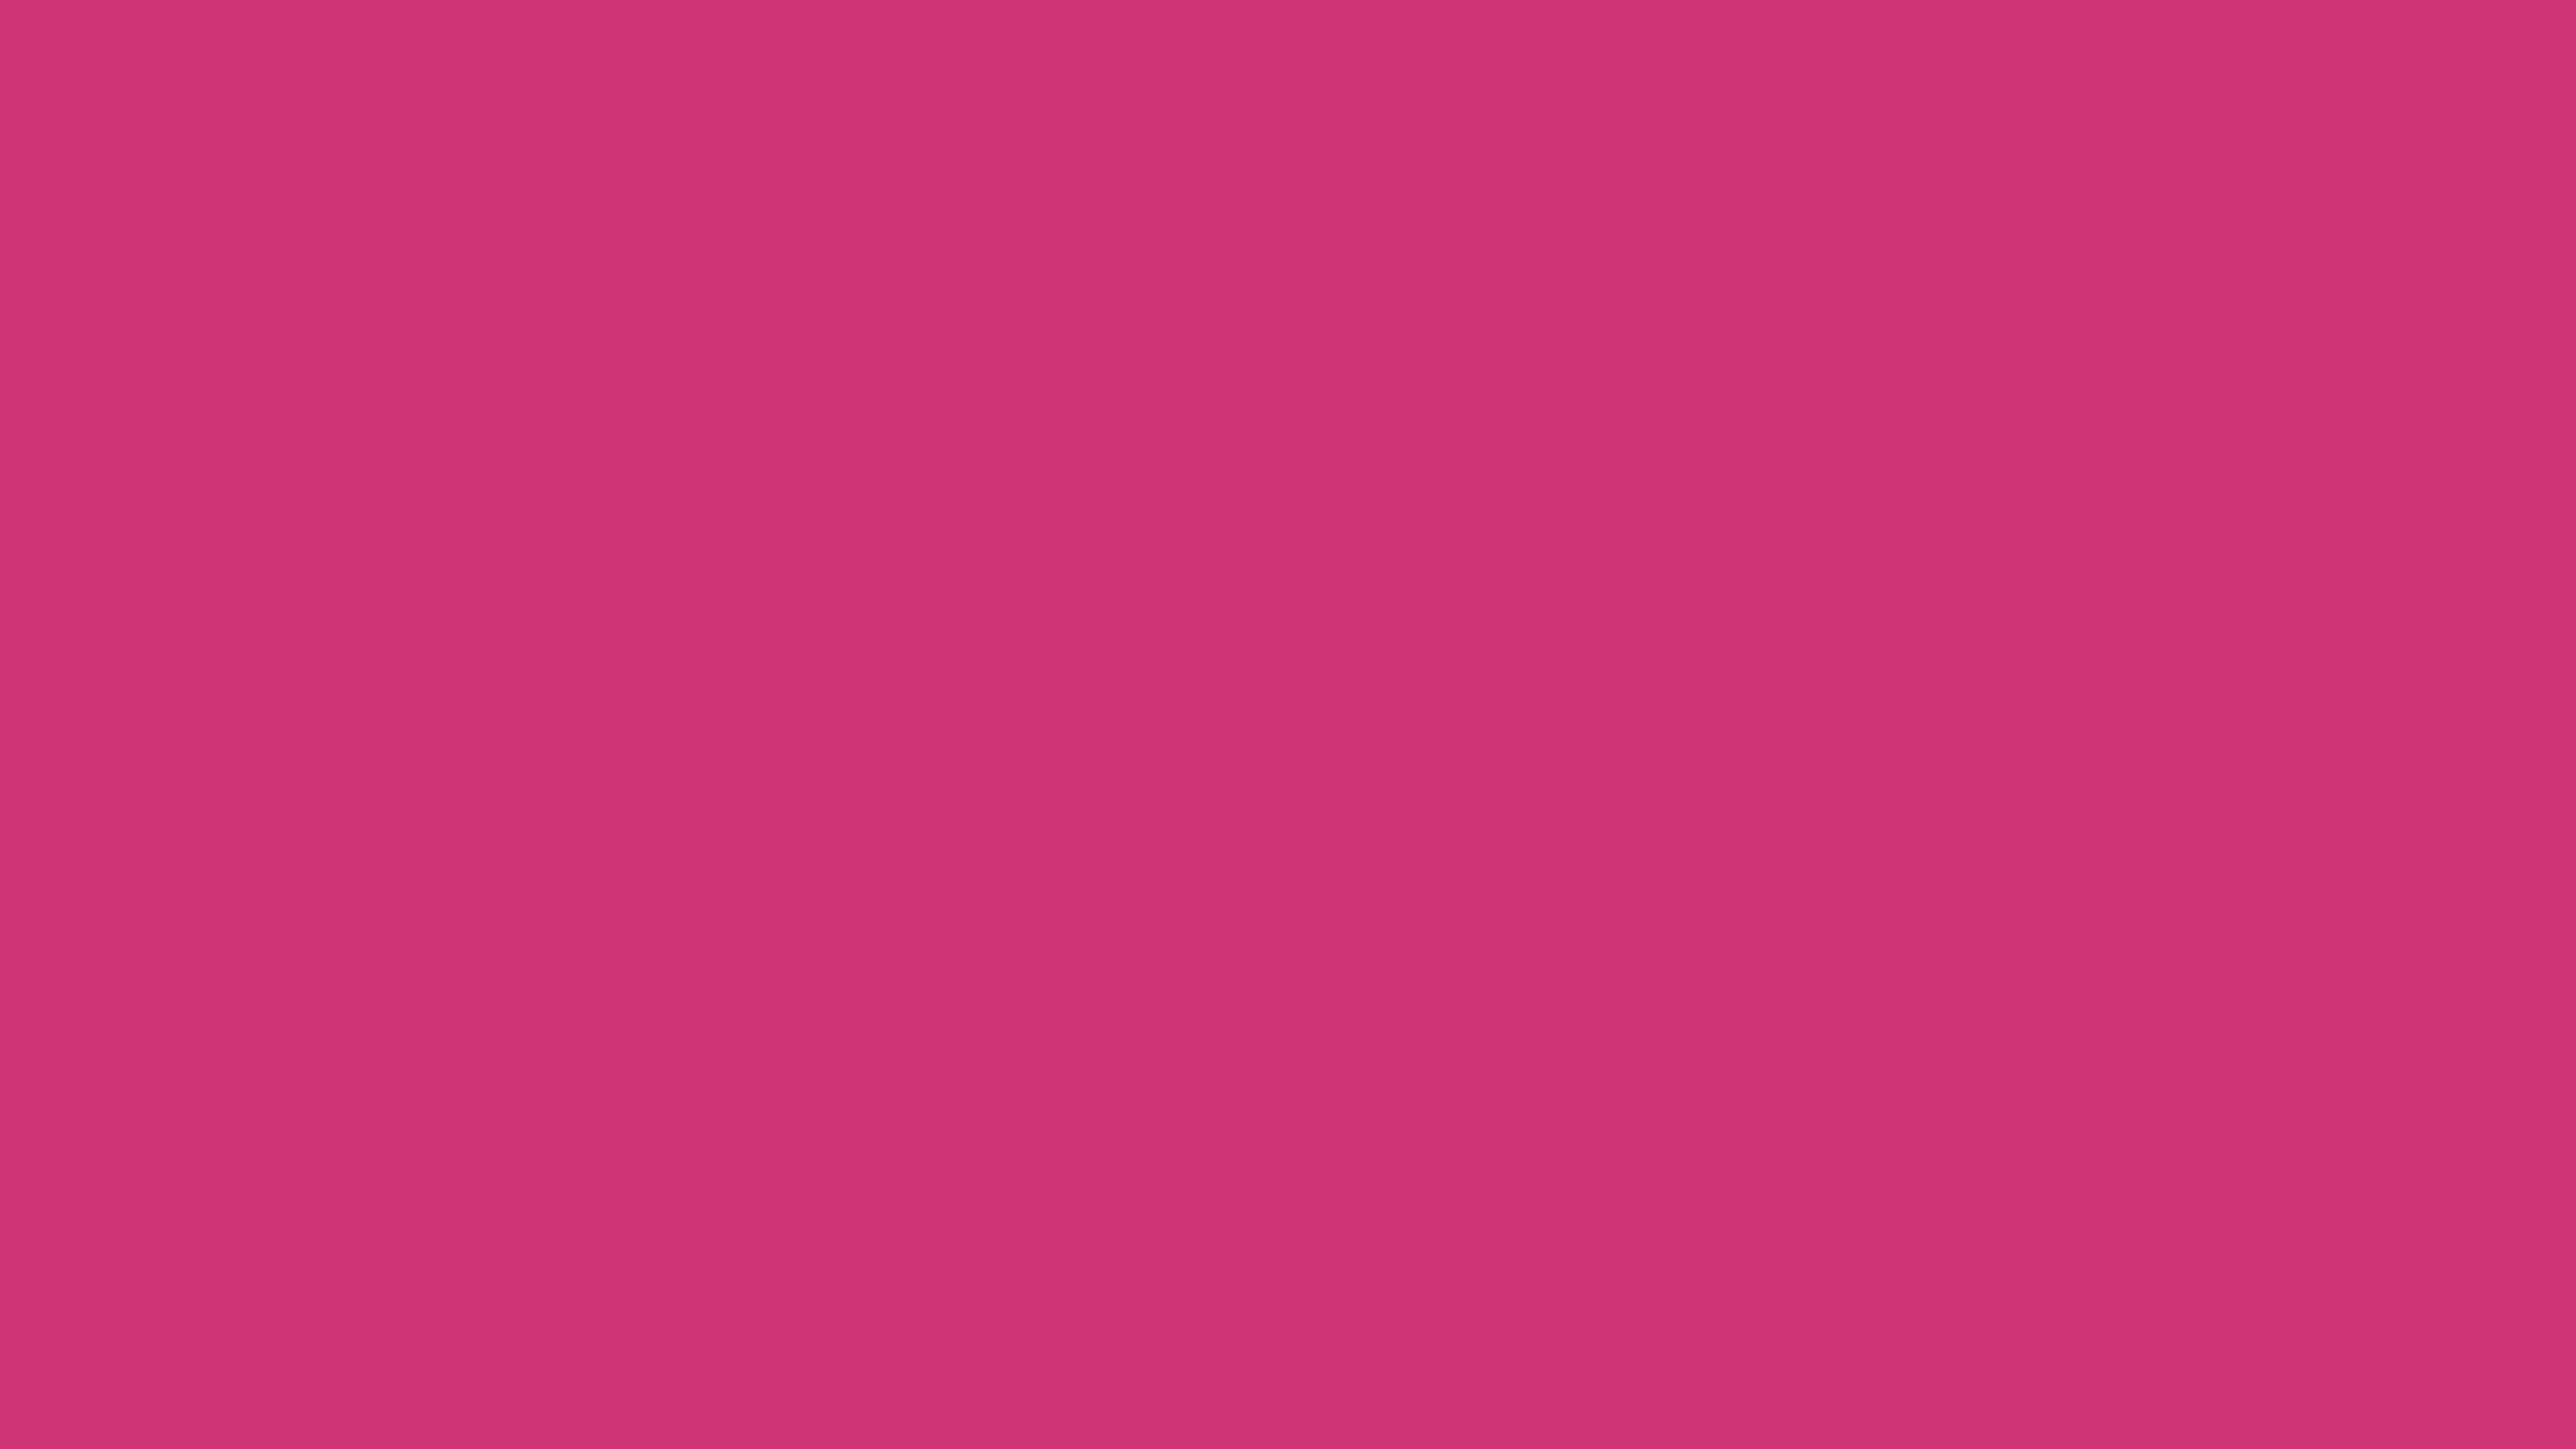 5120x2880 Telemagenta Solid Color Background